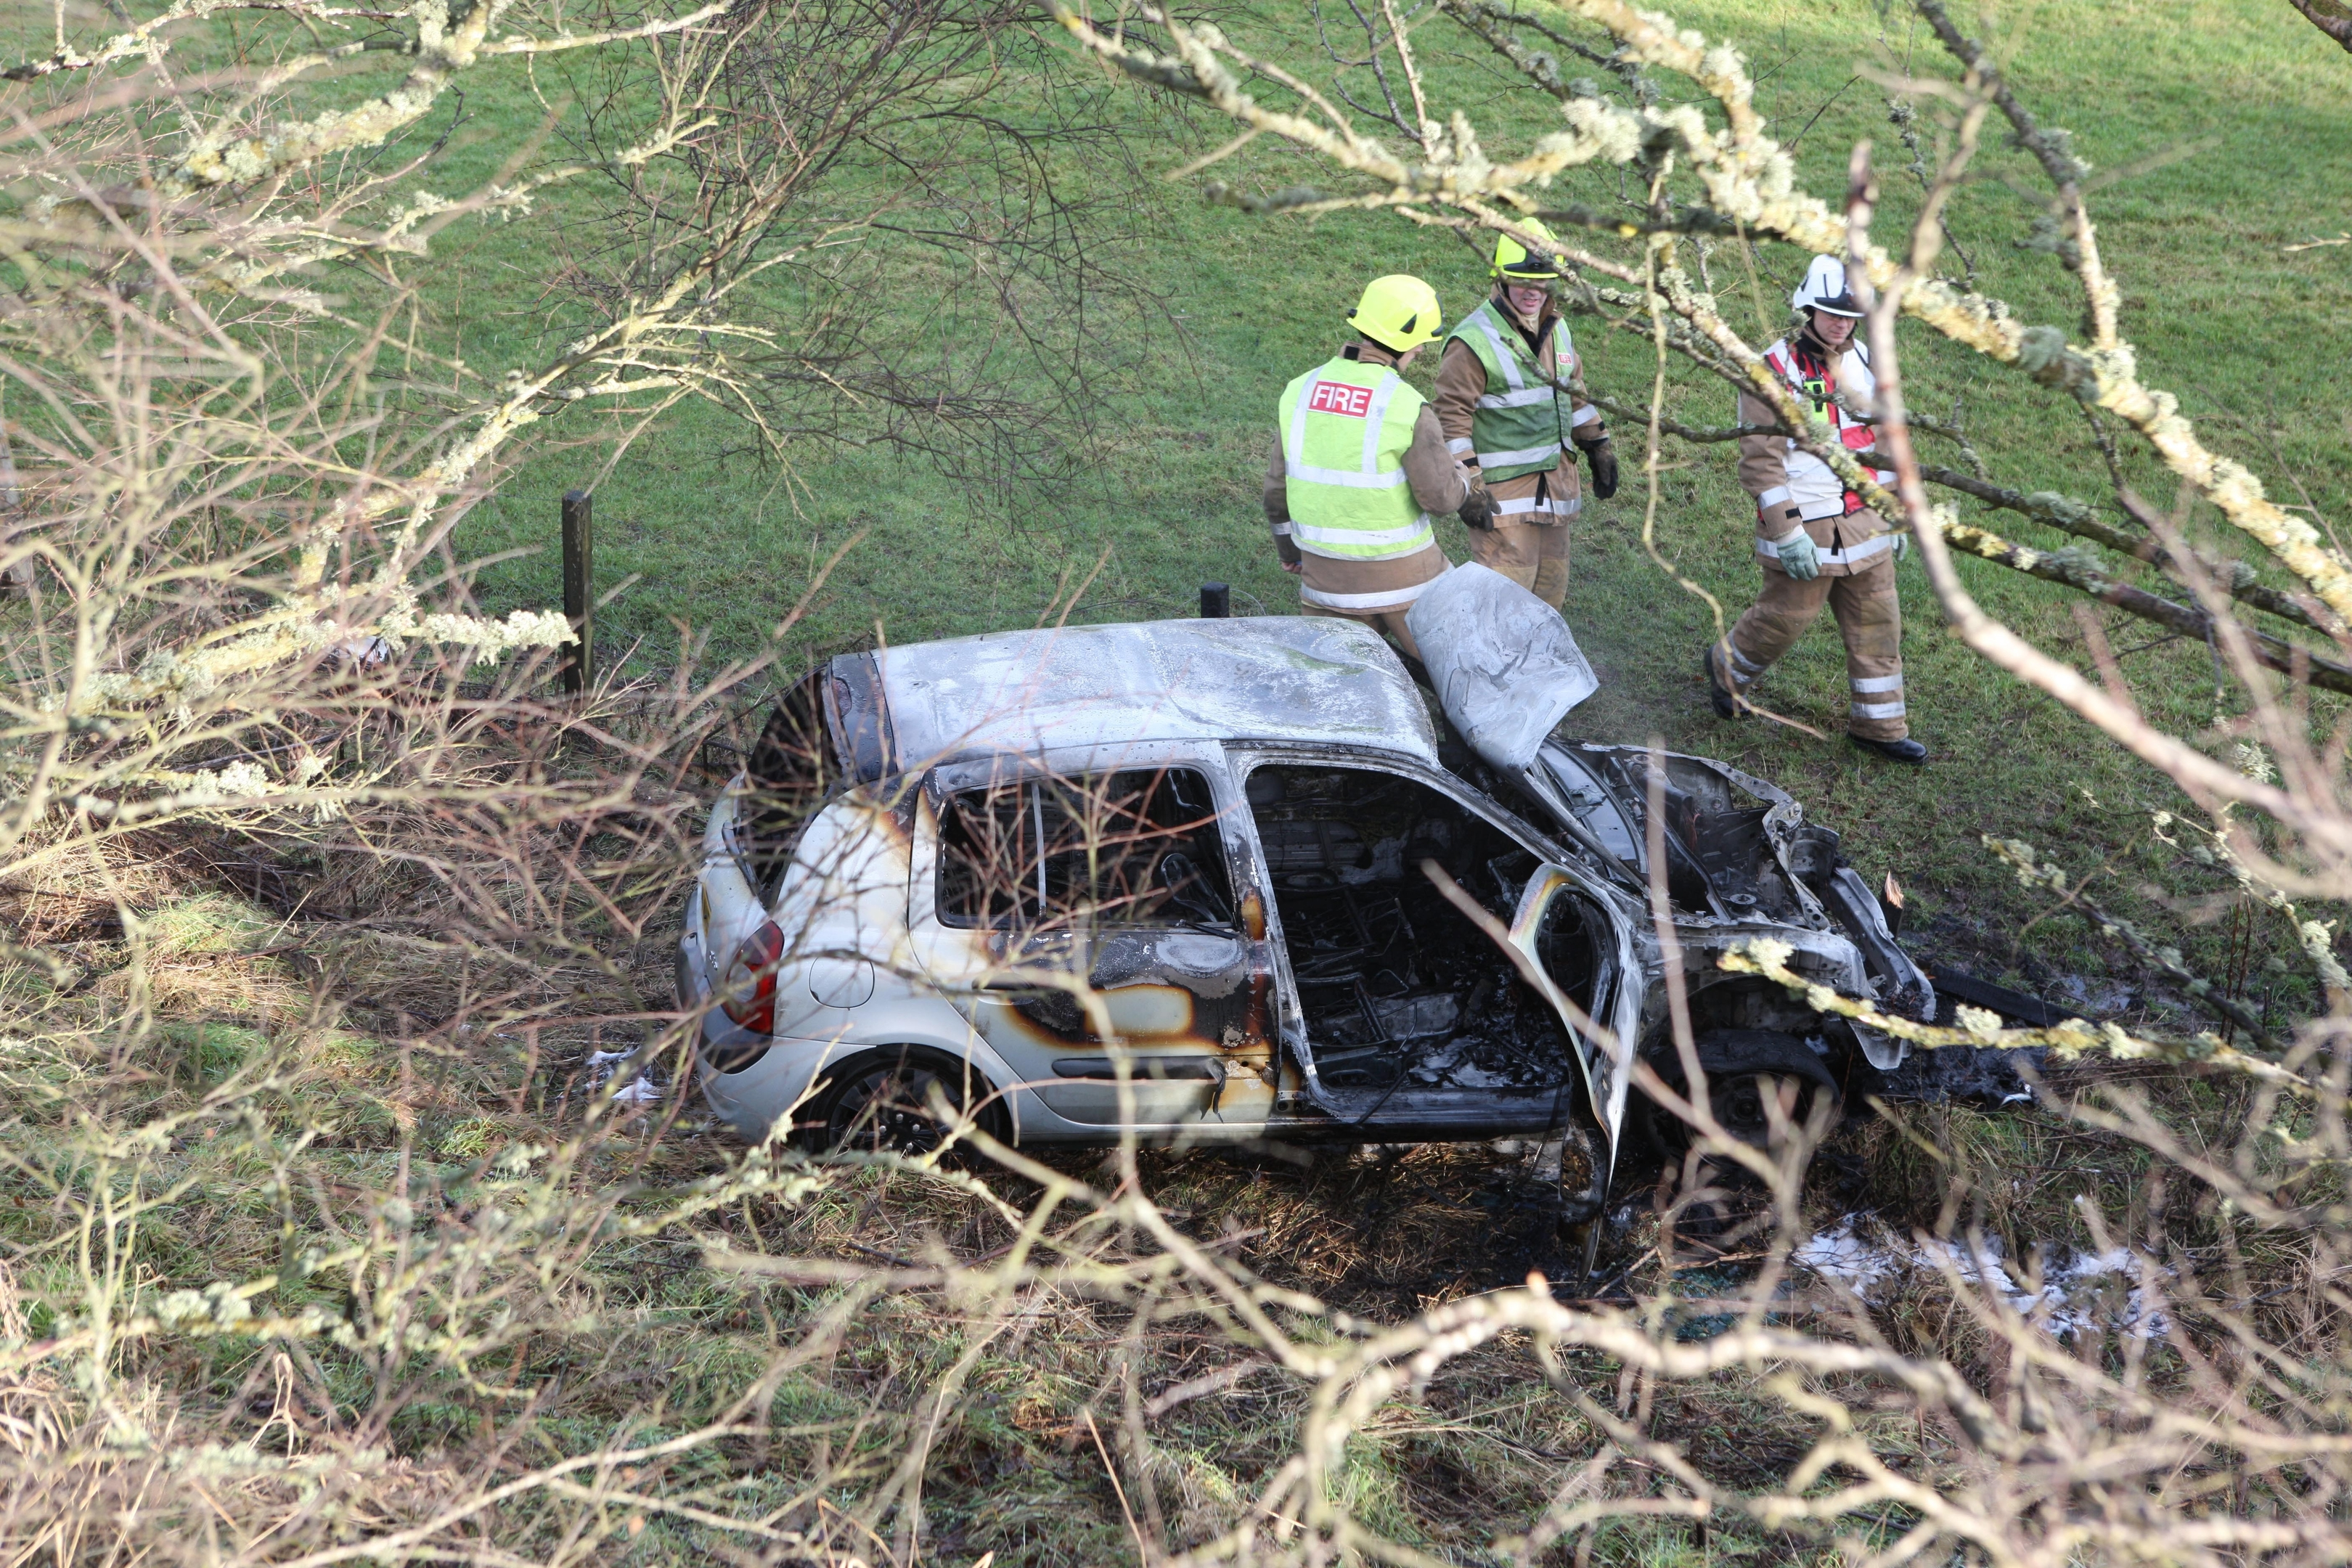 The car burst into flames